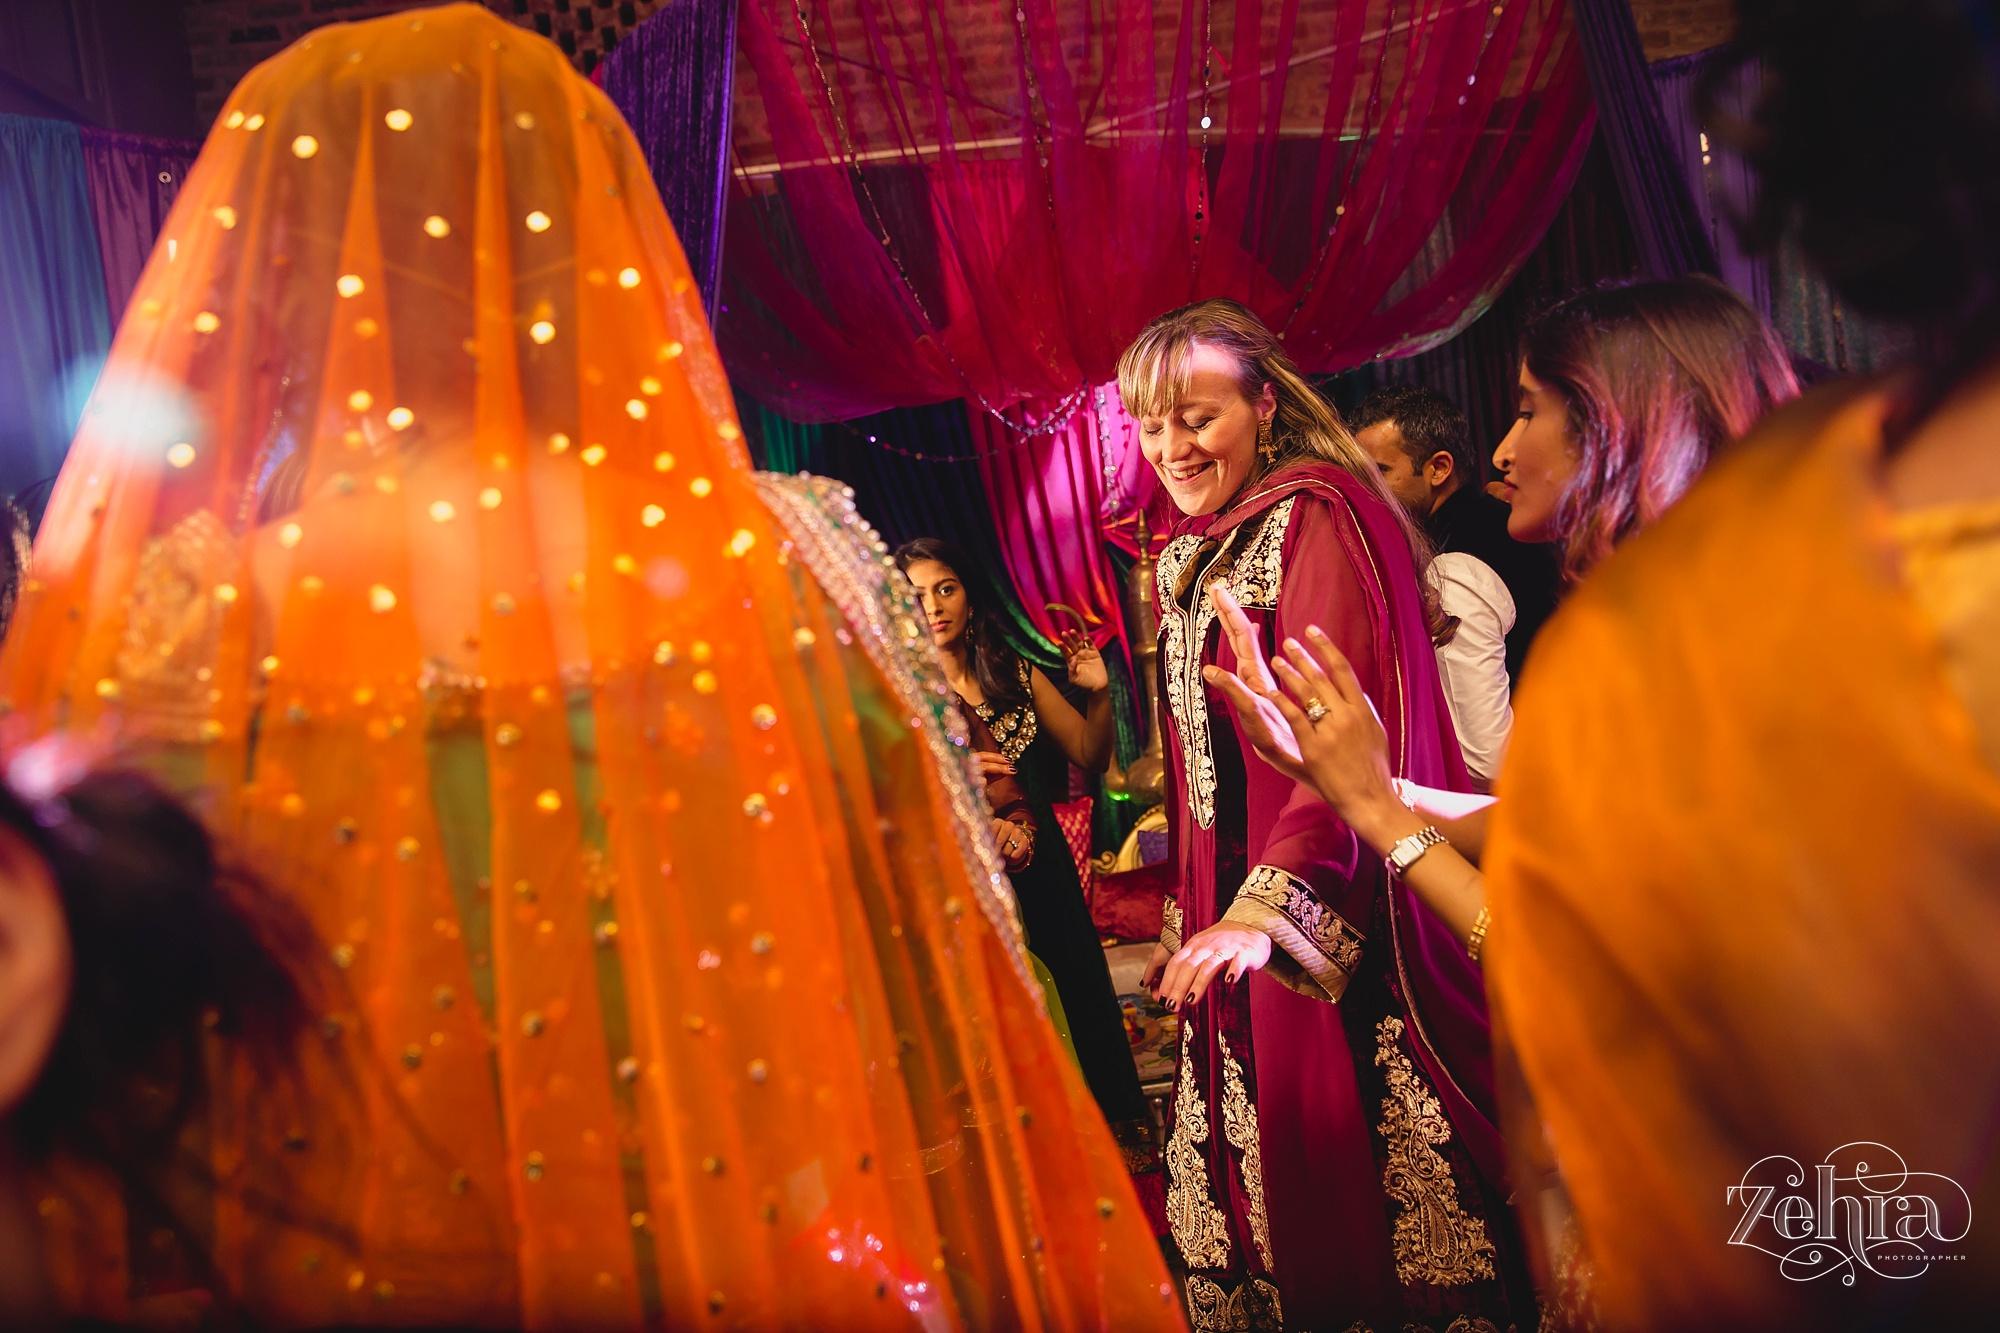 zehra wedding photographer arley hall cheshire045.jpg